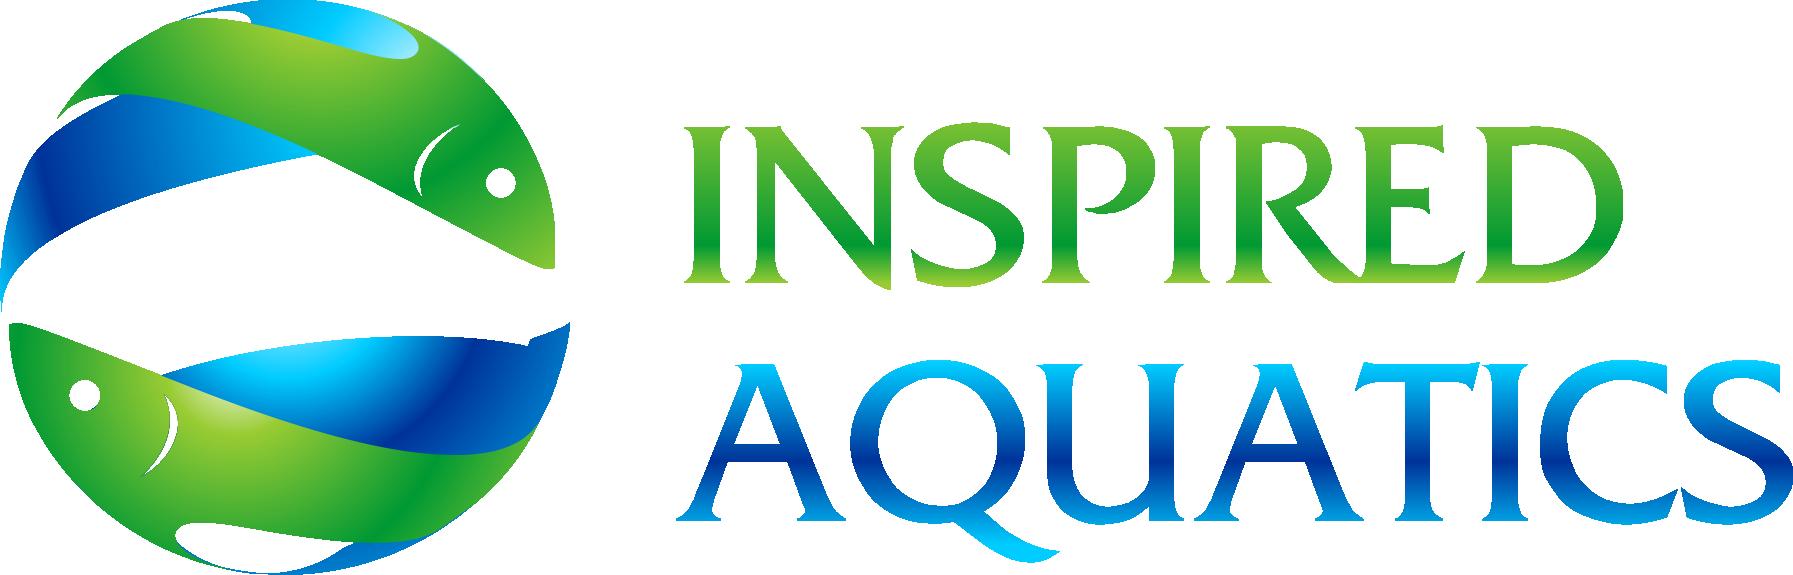 Create a organic, simple yet inspiring design for Inspired Aquatics